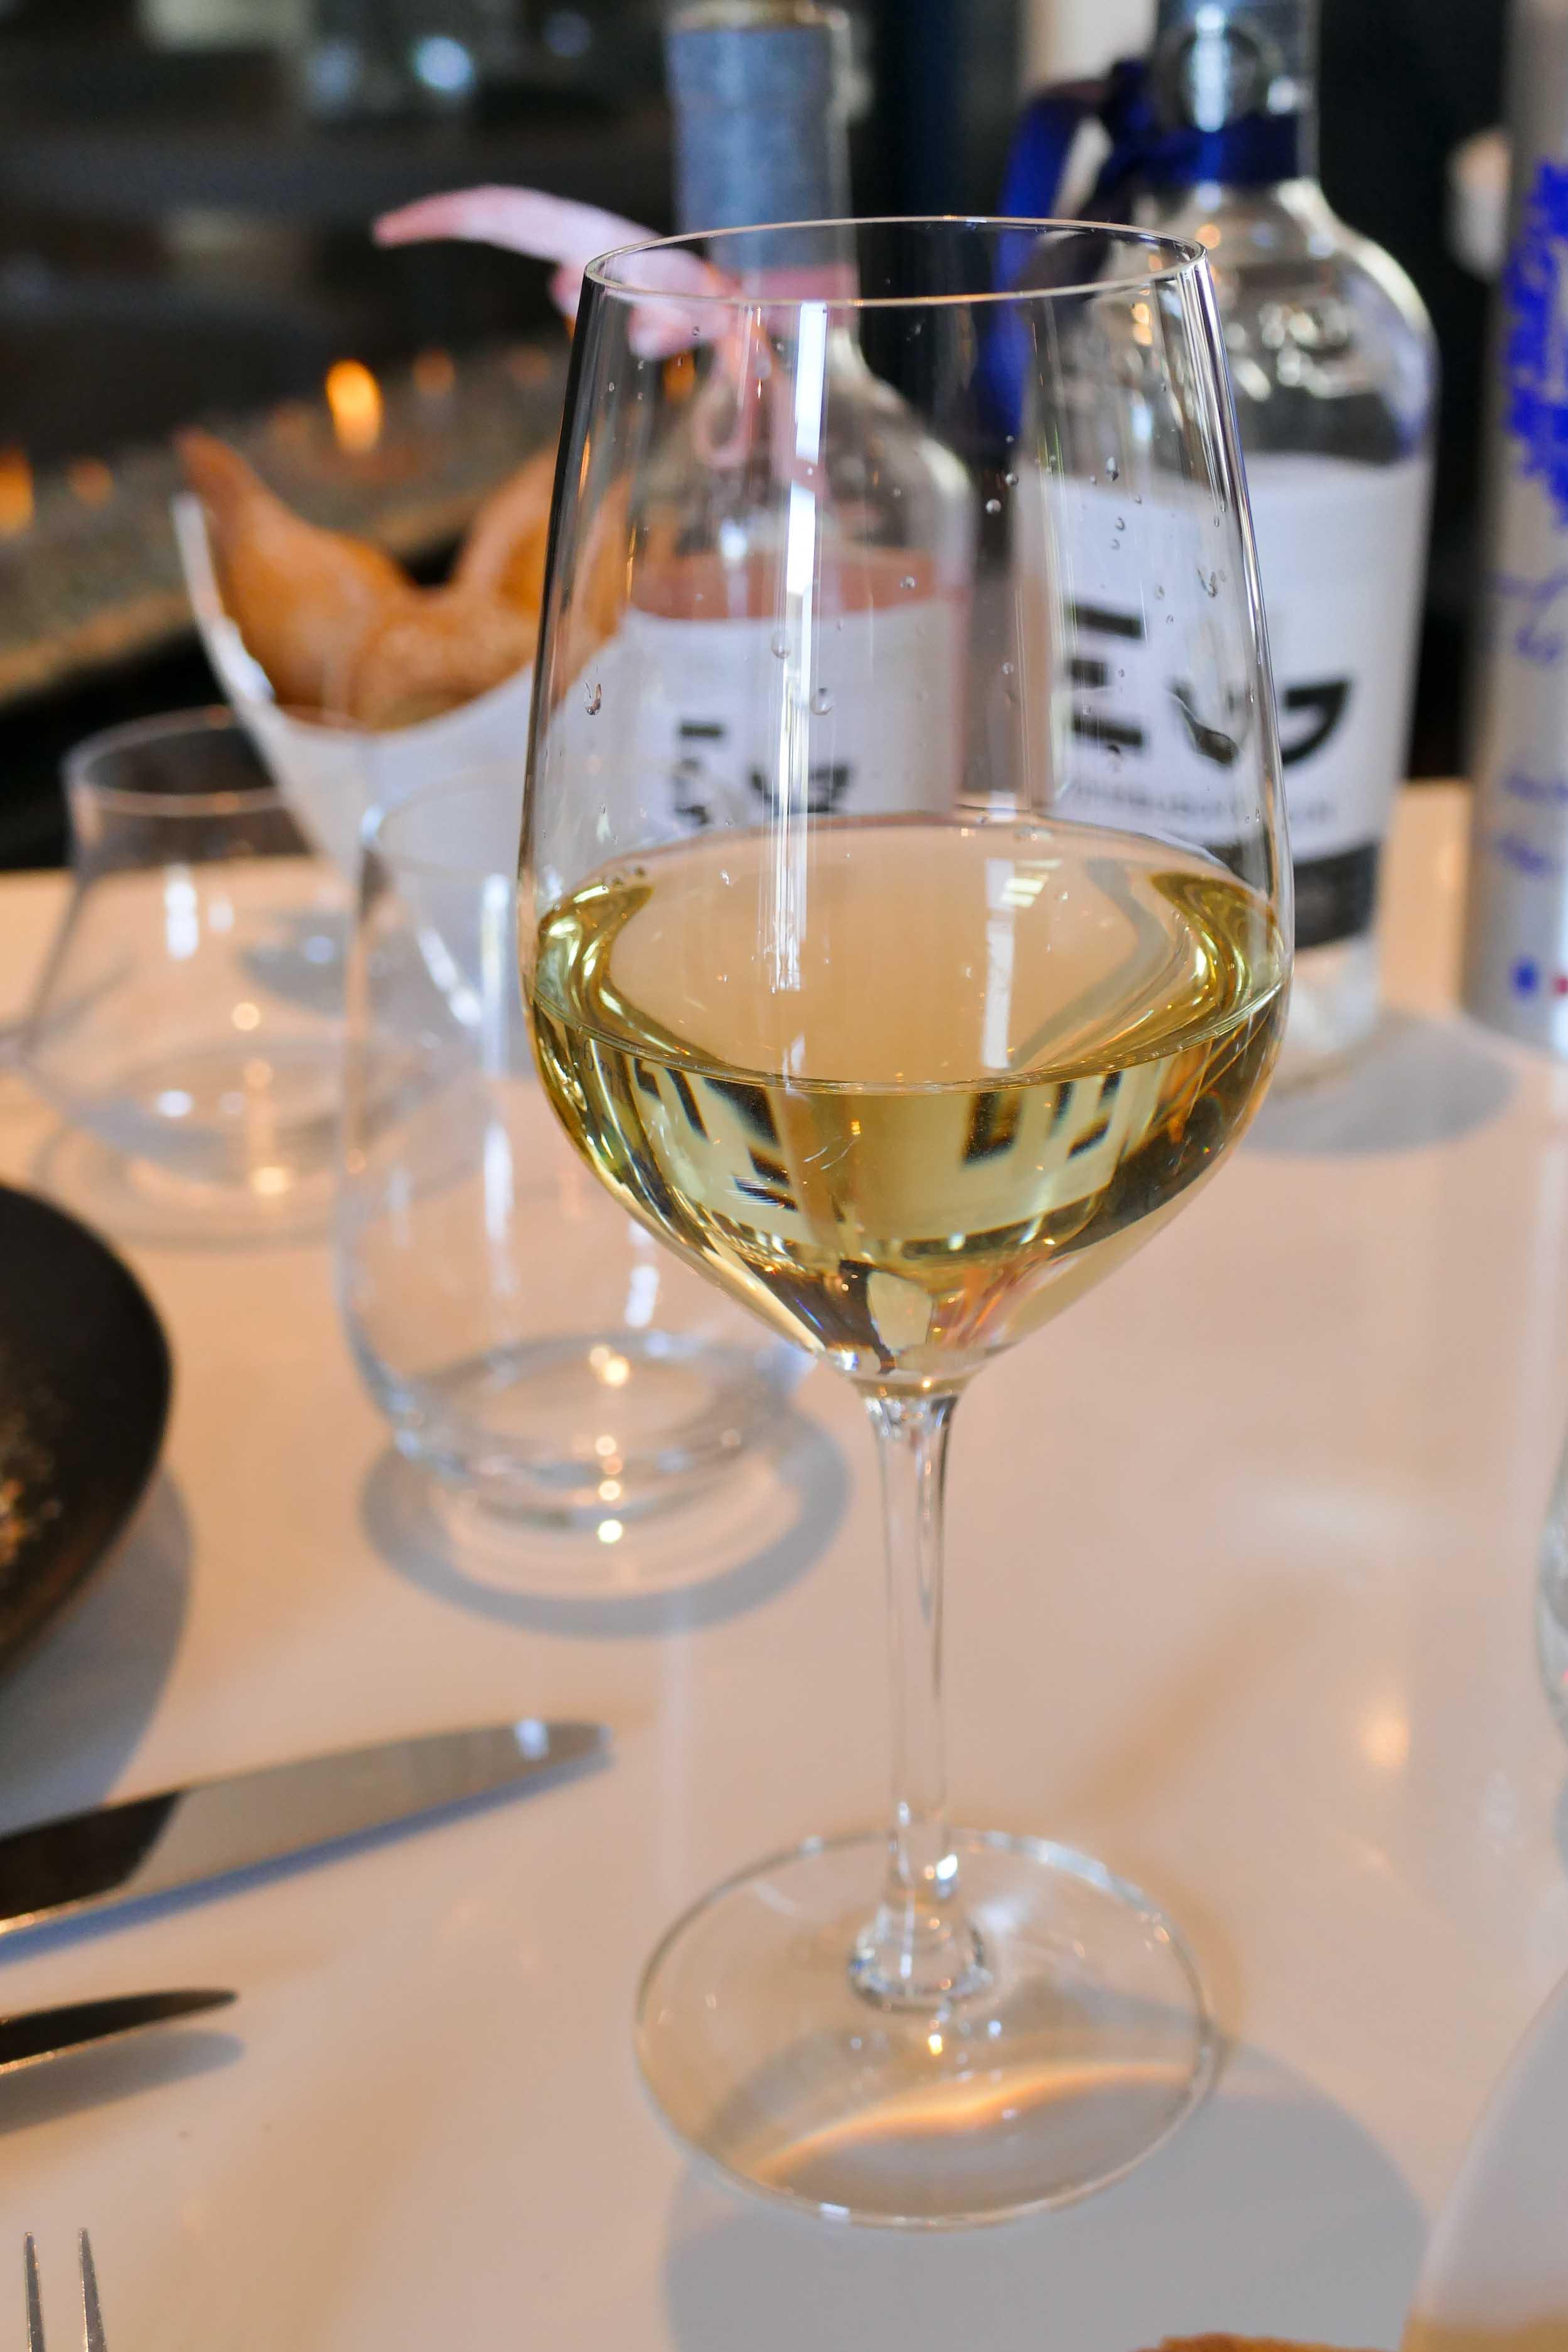 Beautiful Restaurant Oiseau Bleu Bordeaux Images - Joshkrajcik.us ...